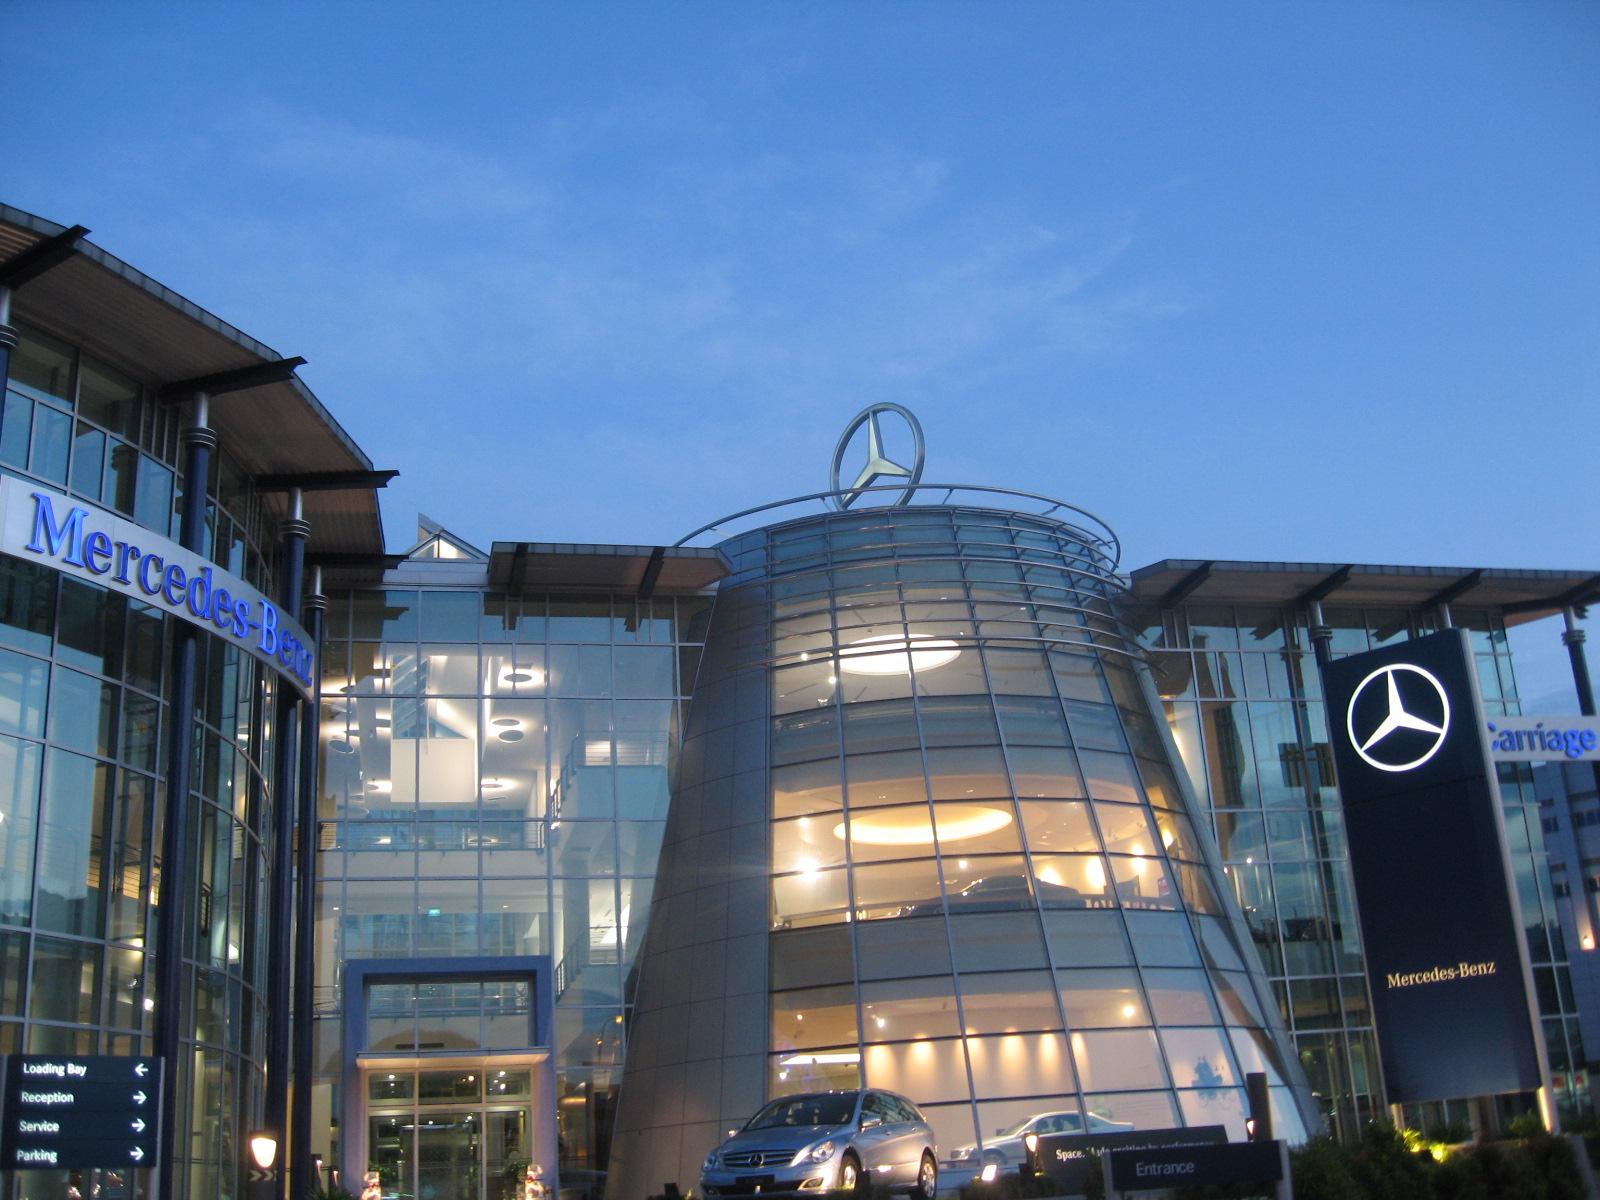 File:Mercedes-Benz Center.JPG - Wikimedia Commons